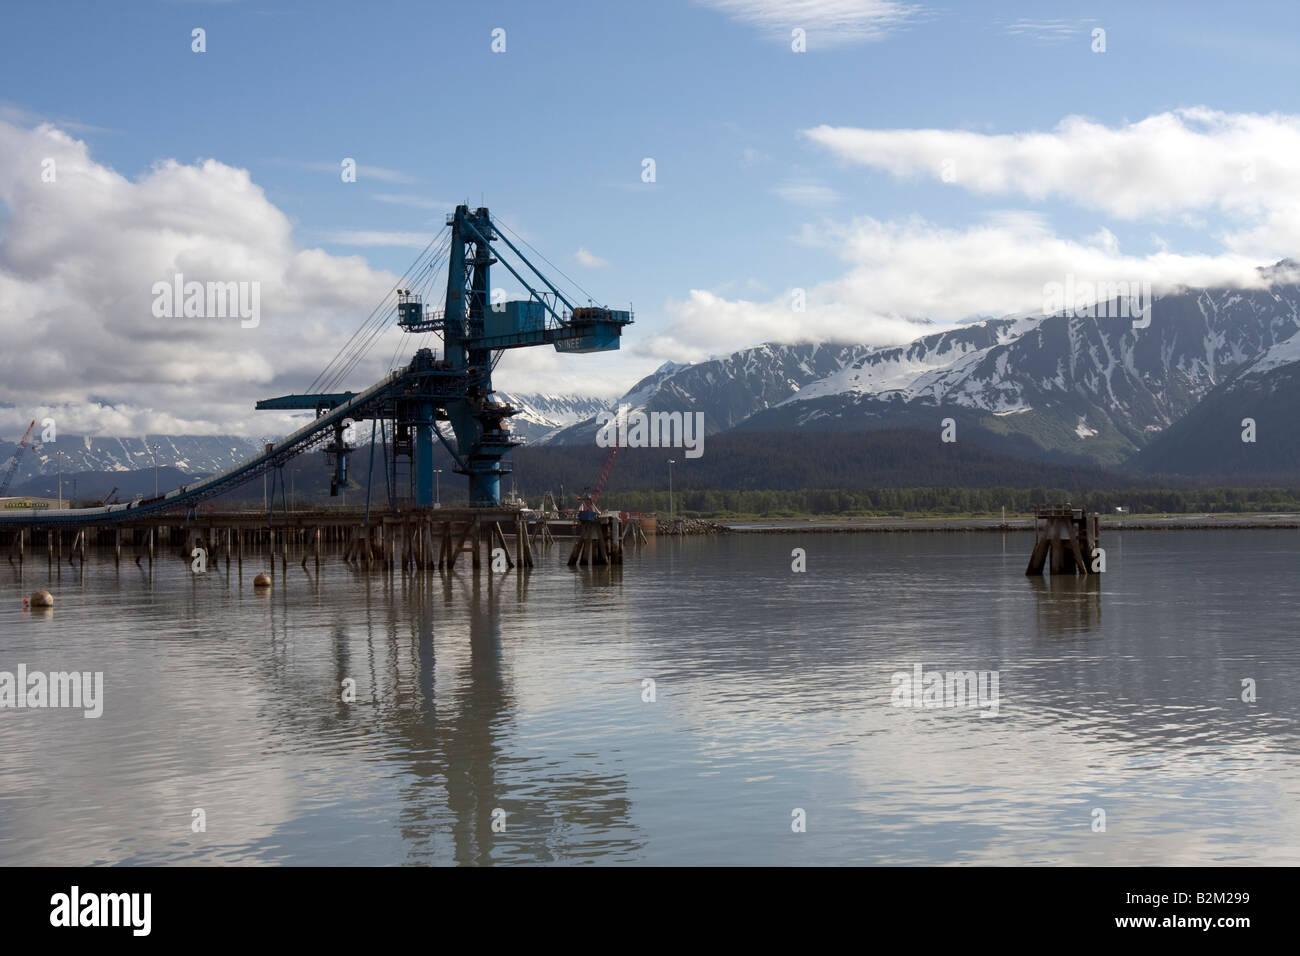 Personals in seward ny Personals in Seward, Alaska